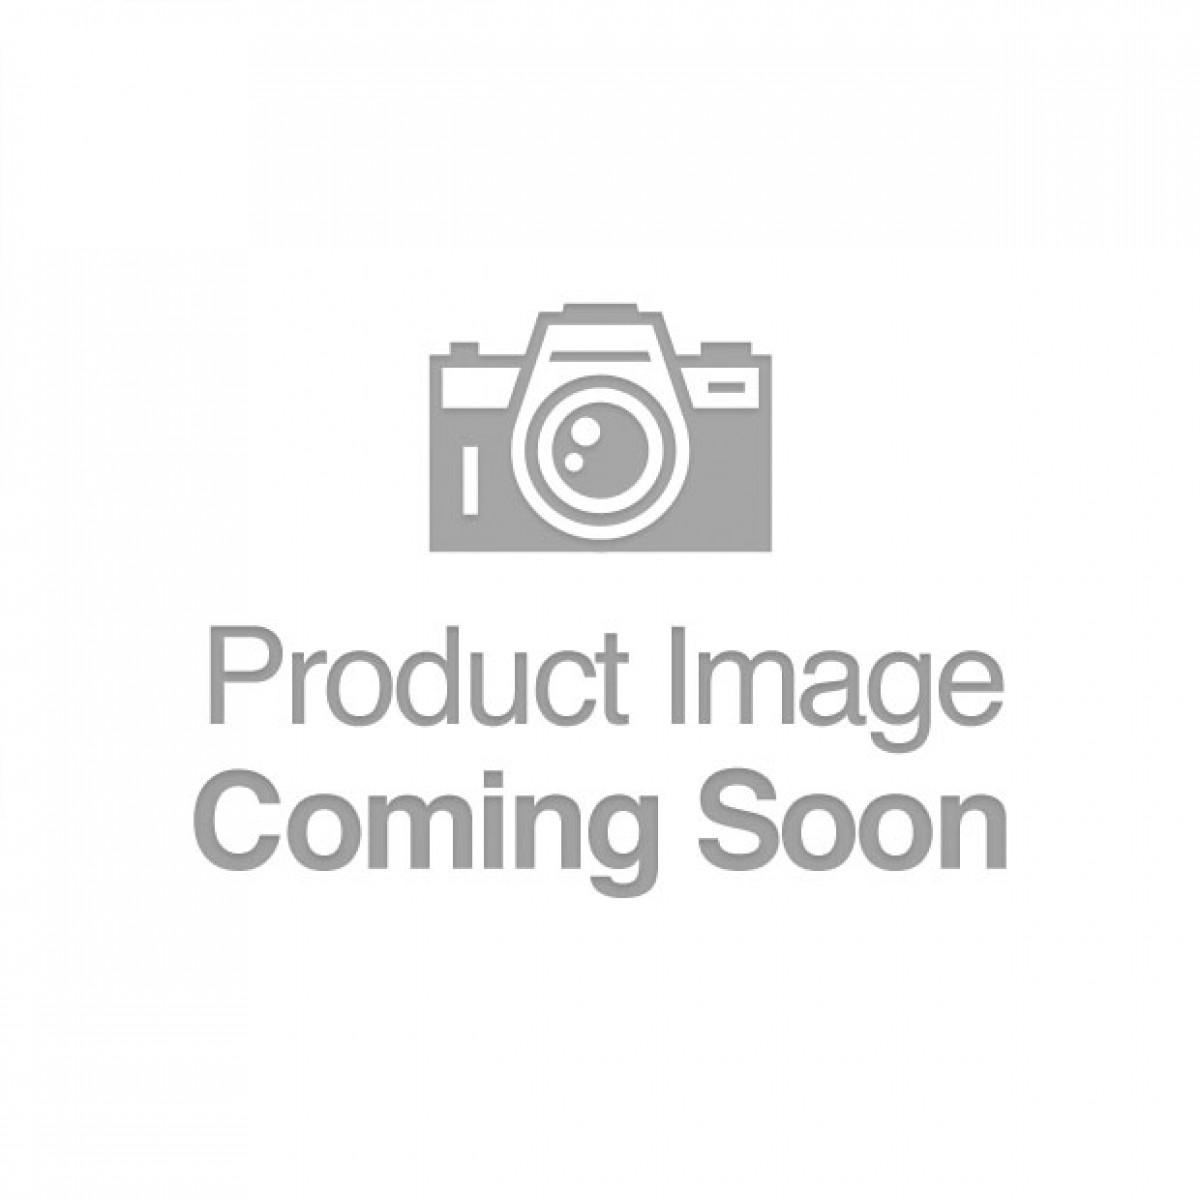 Aneros Trident Series Prostate Stimulator MGX Syn Trident - Black